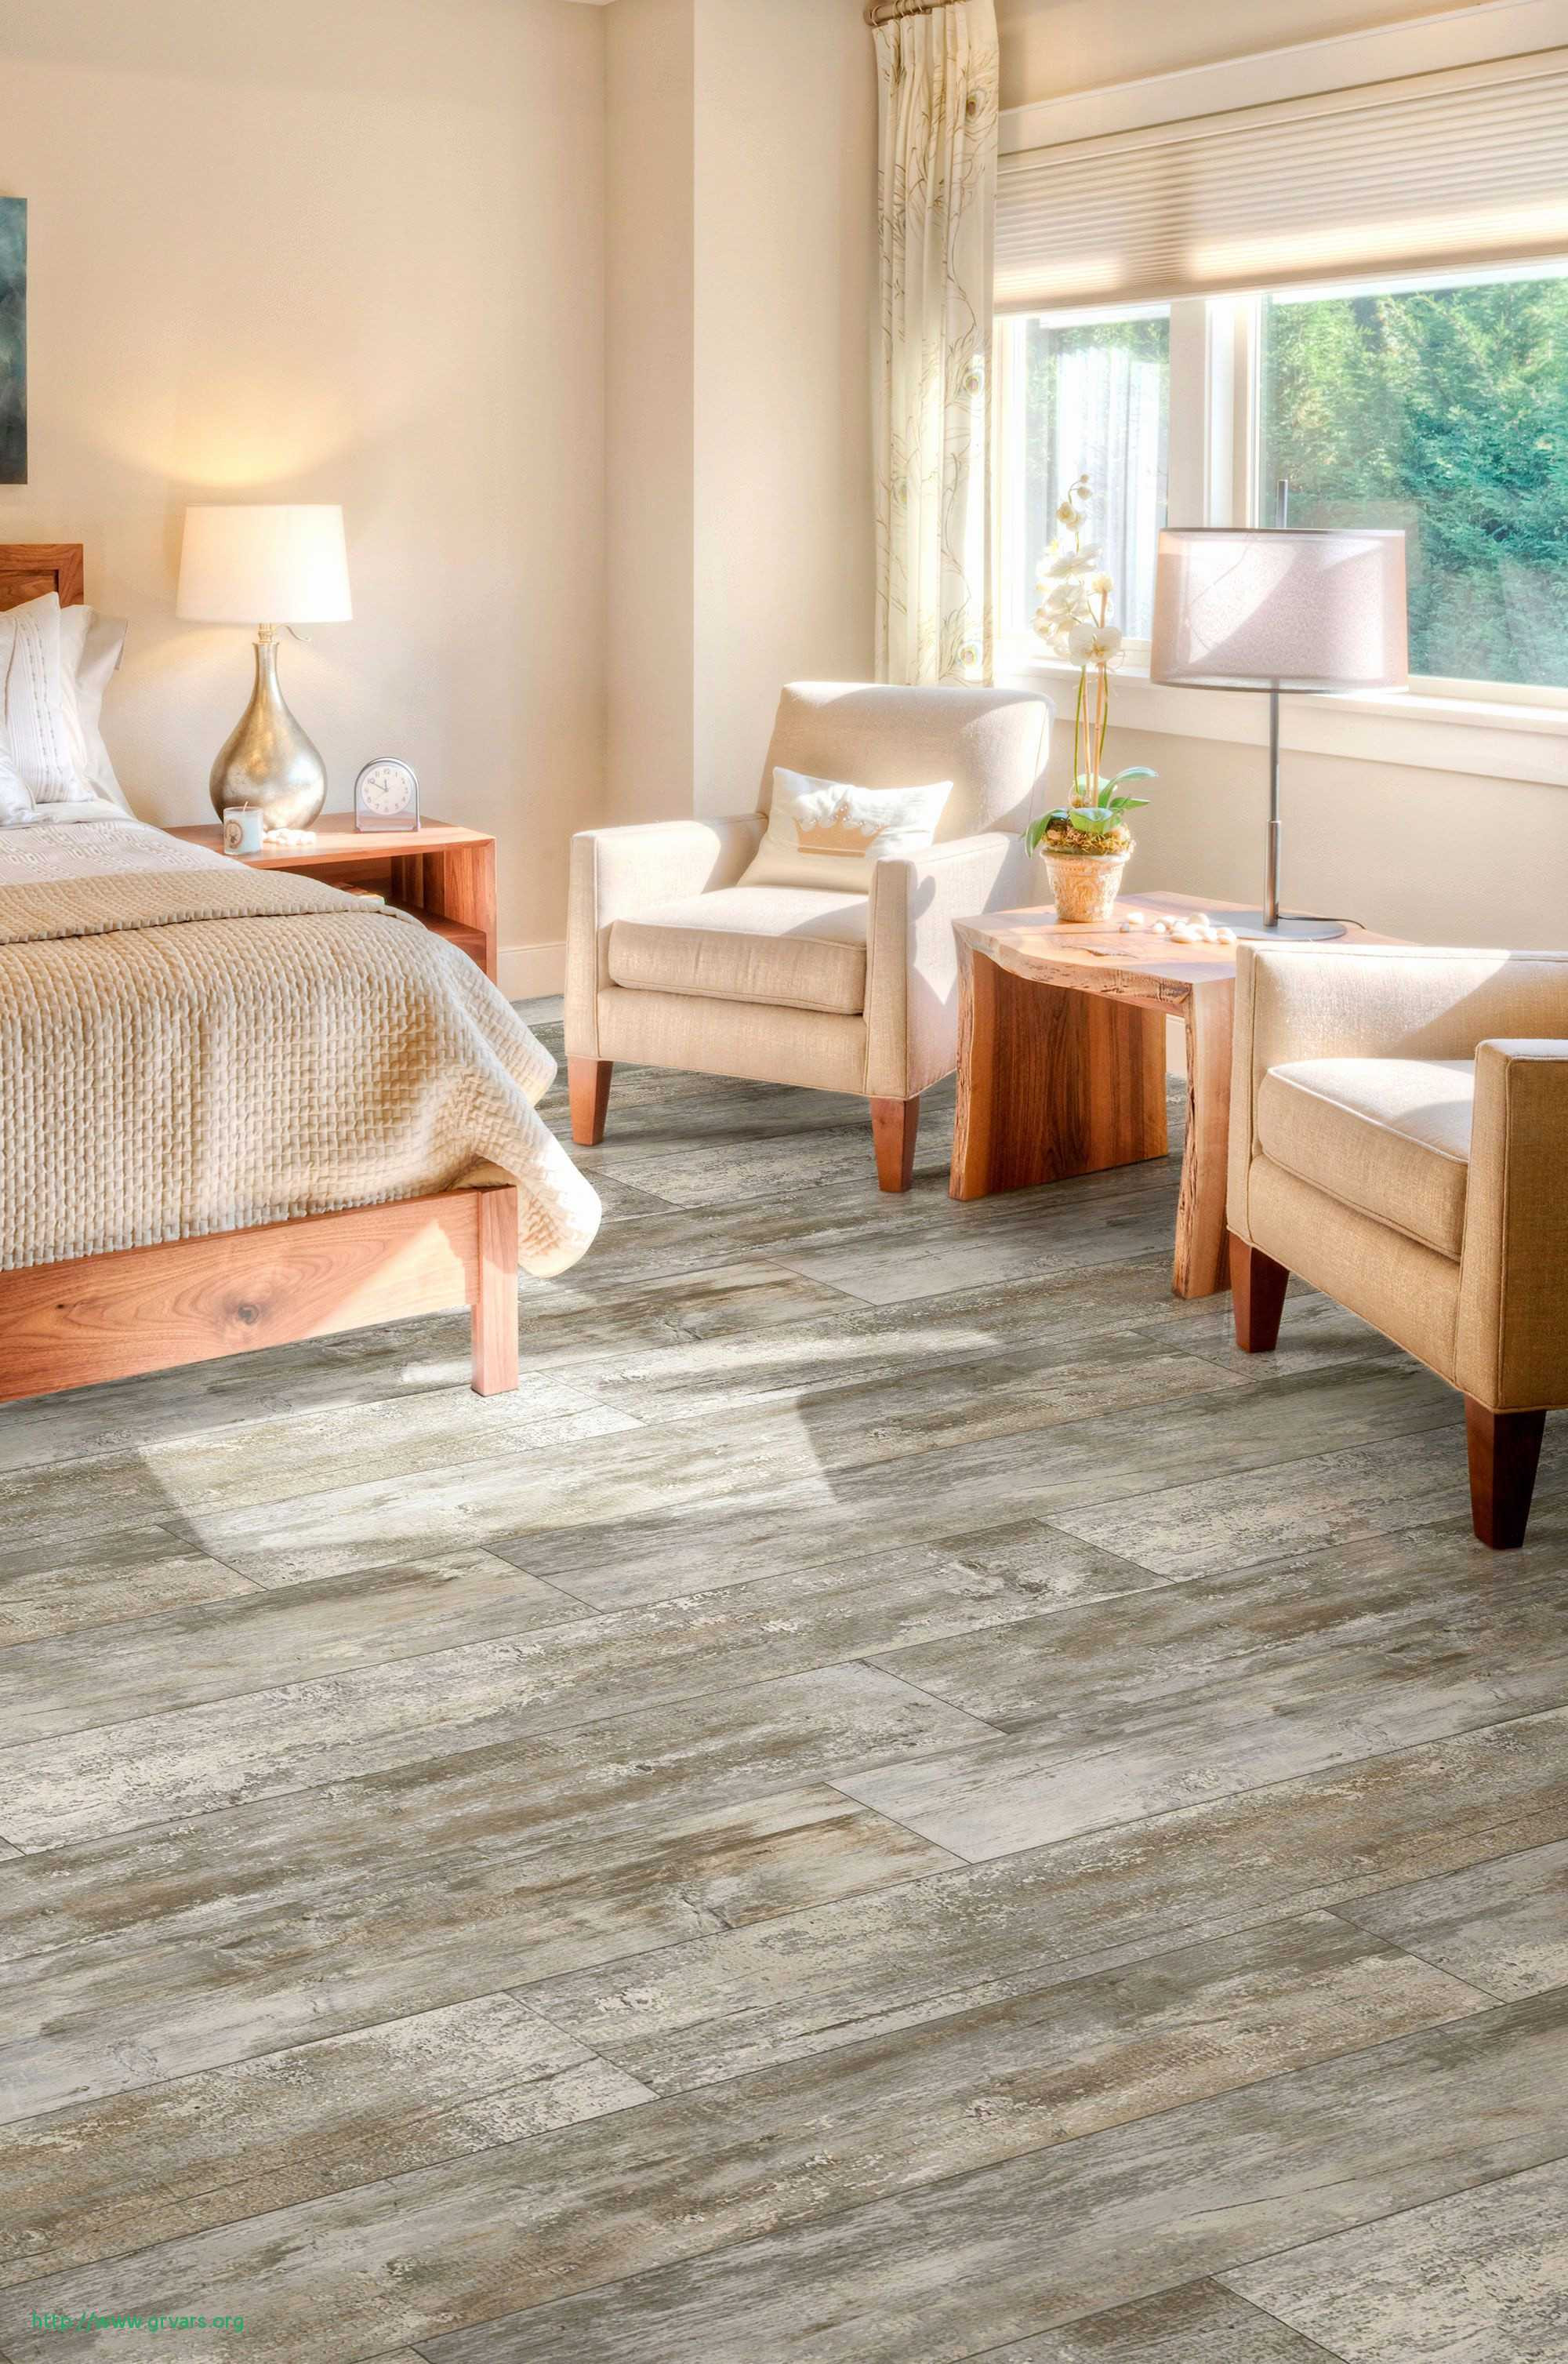 how to install hardwood floors of 16 charmant step by step hardwood floor installation ideas blog regarding hardwood floor wood hardwood floor types unique i pinimg 736x 0d 7b 00 luxury wood